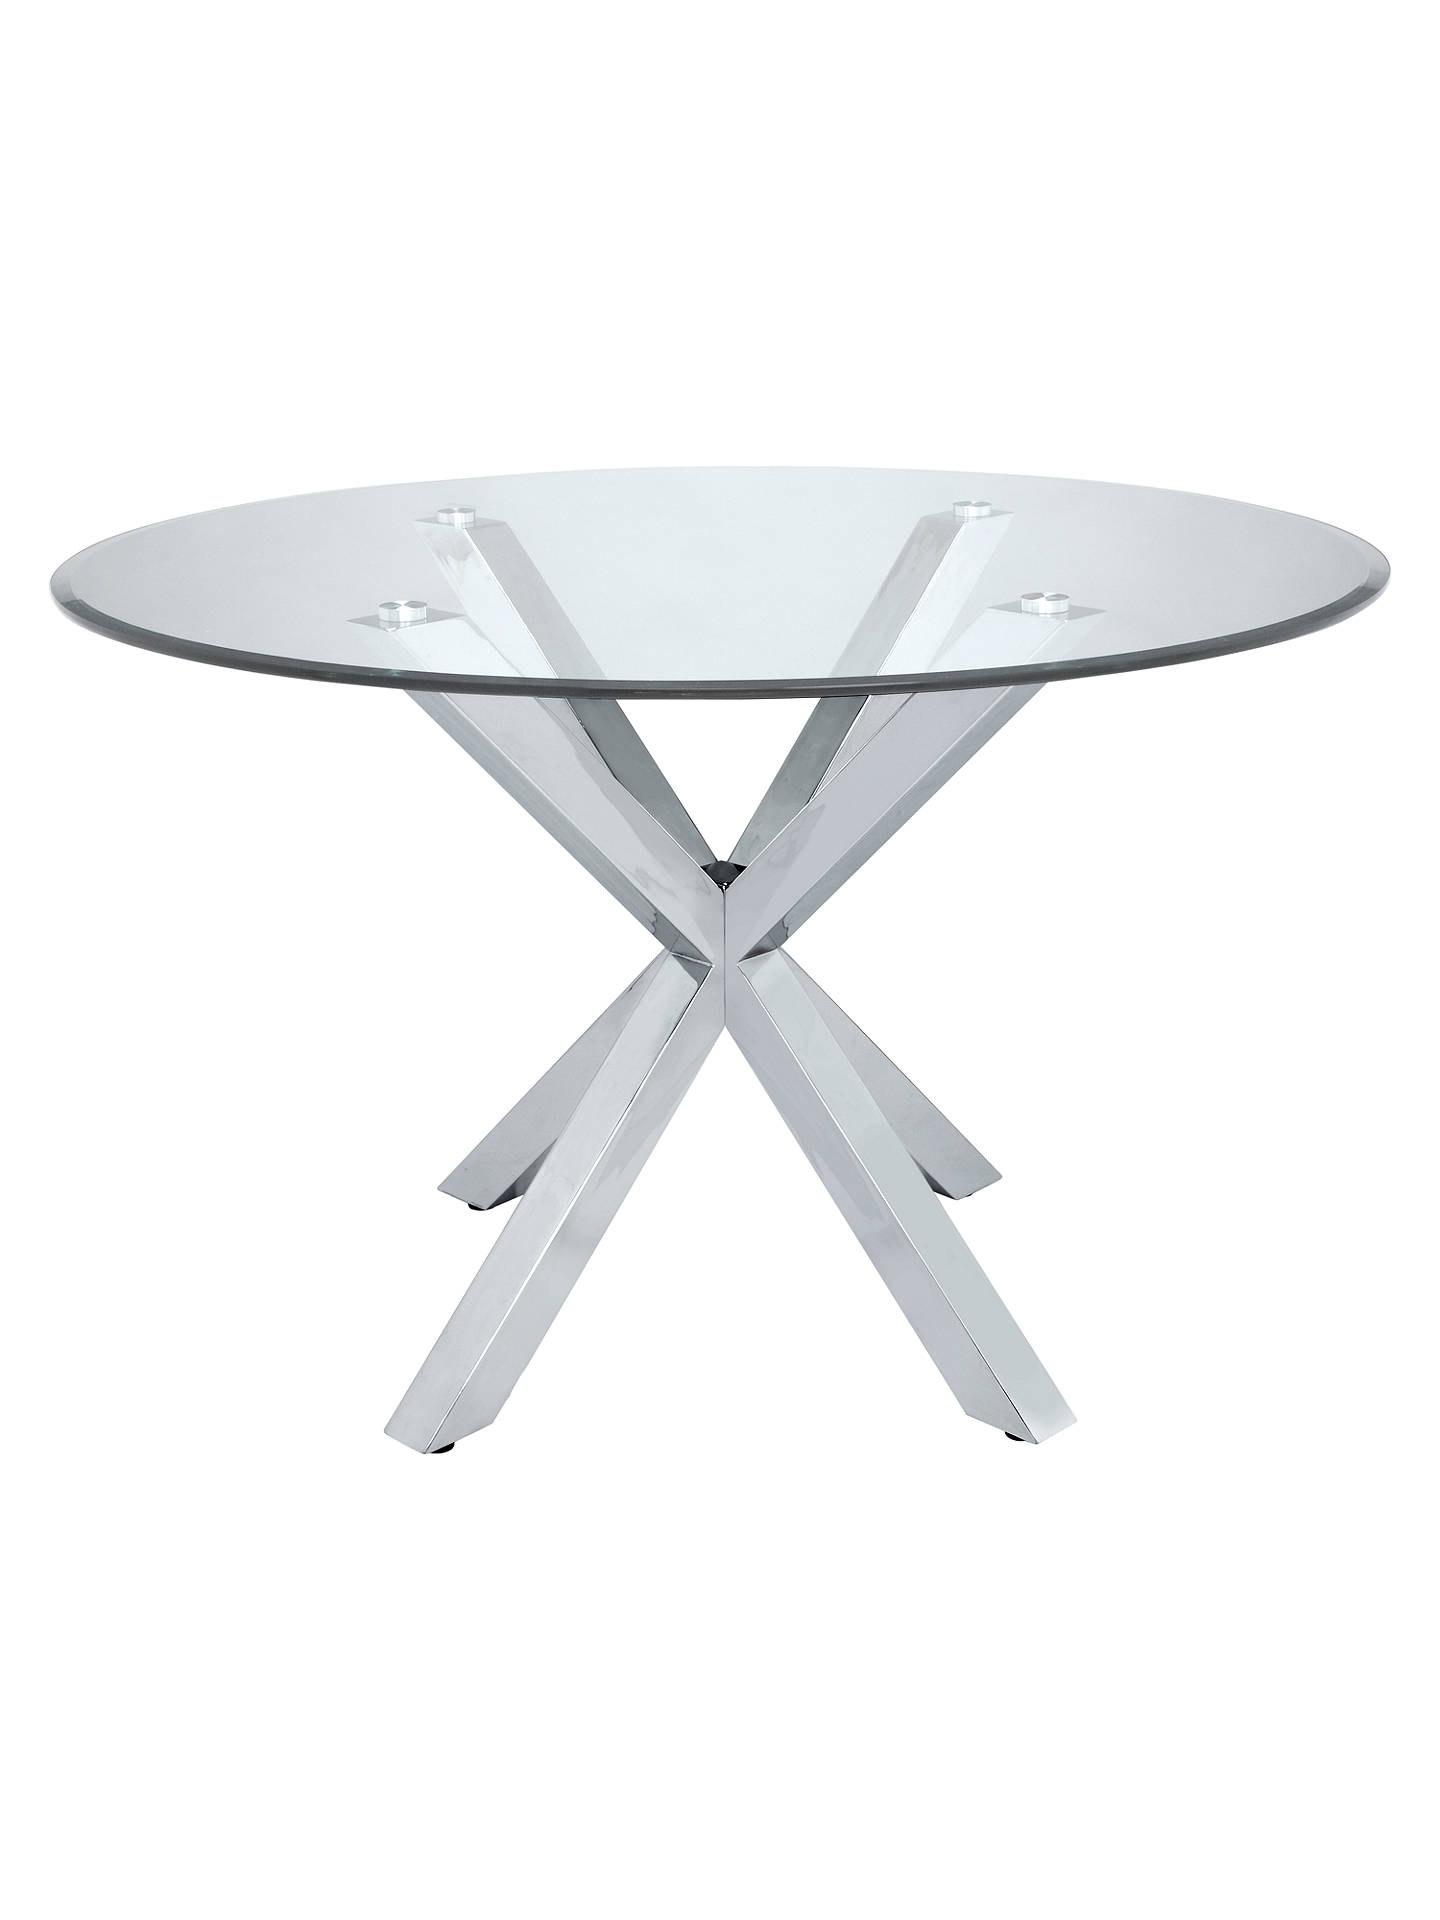 john lewis star 4 seater glass dining table at john lewis. Black Bedroom Furniture Sets. Home Design Ideas